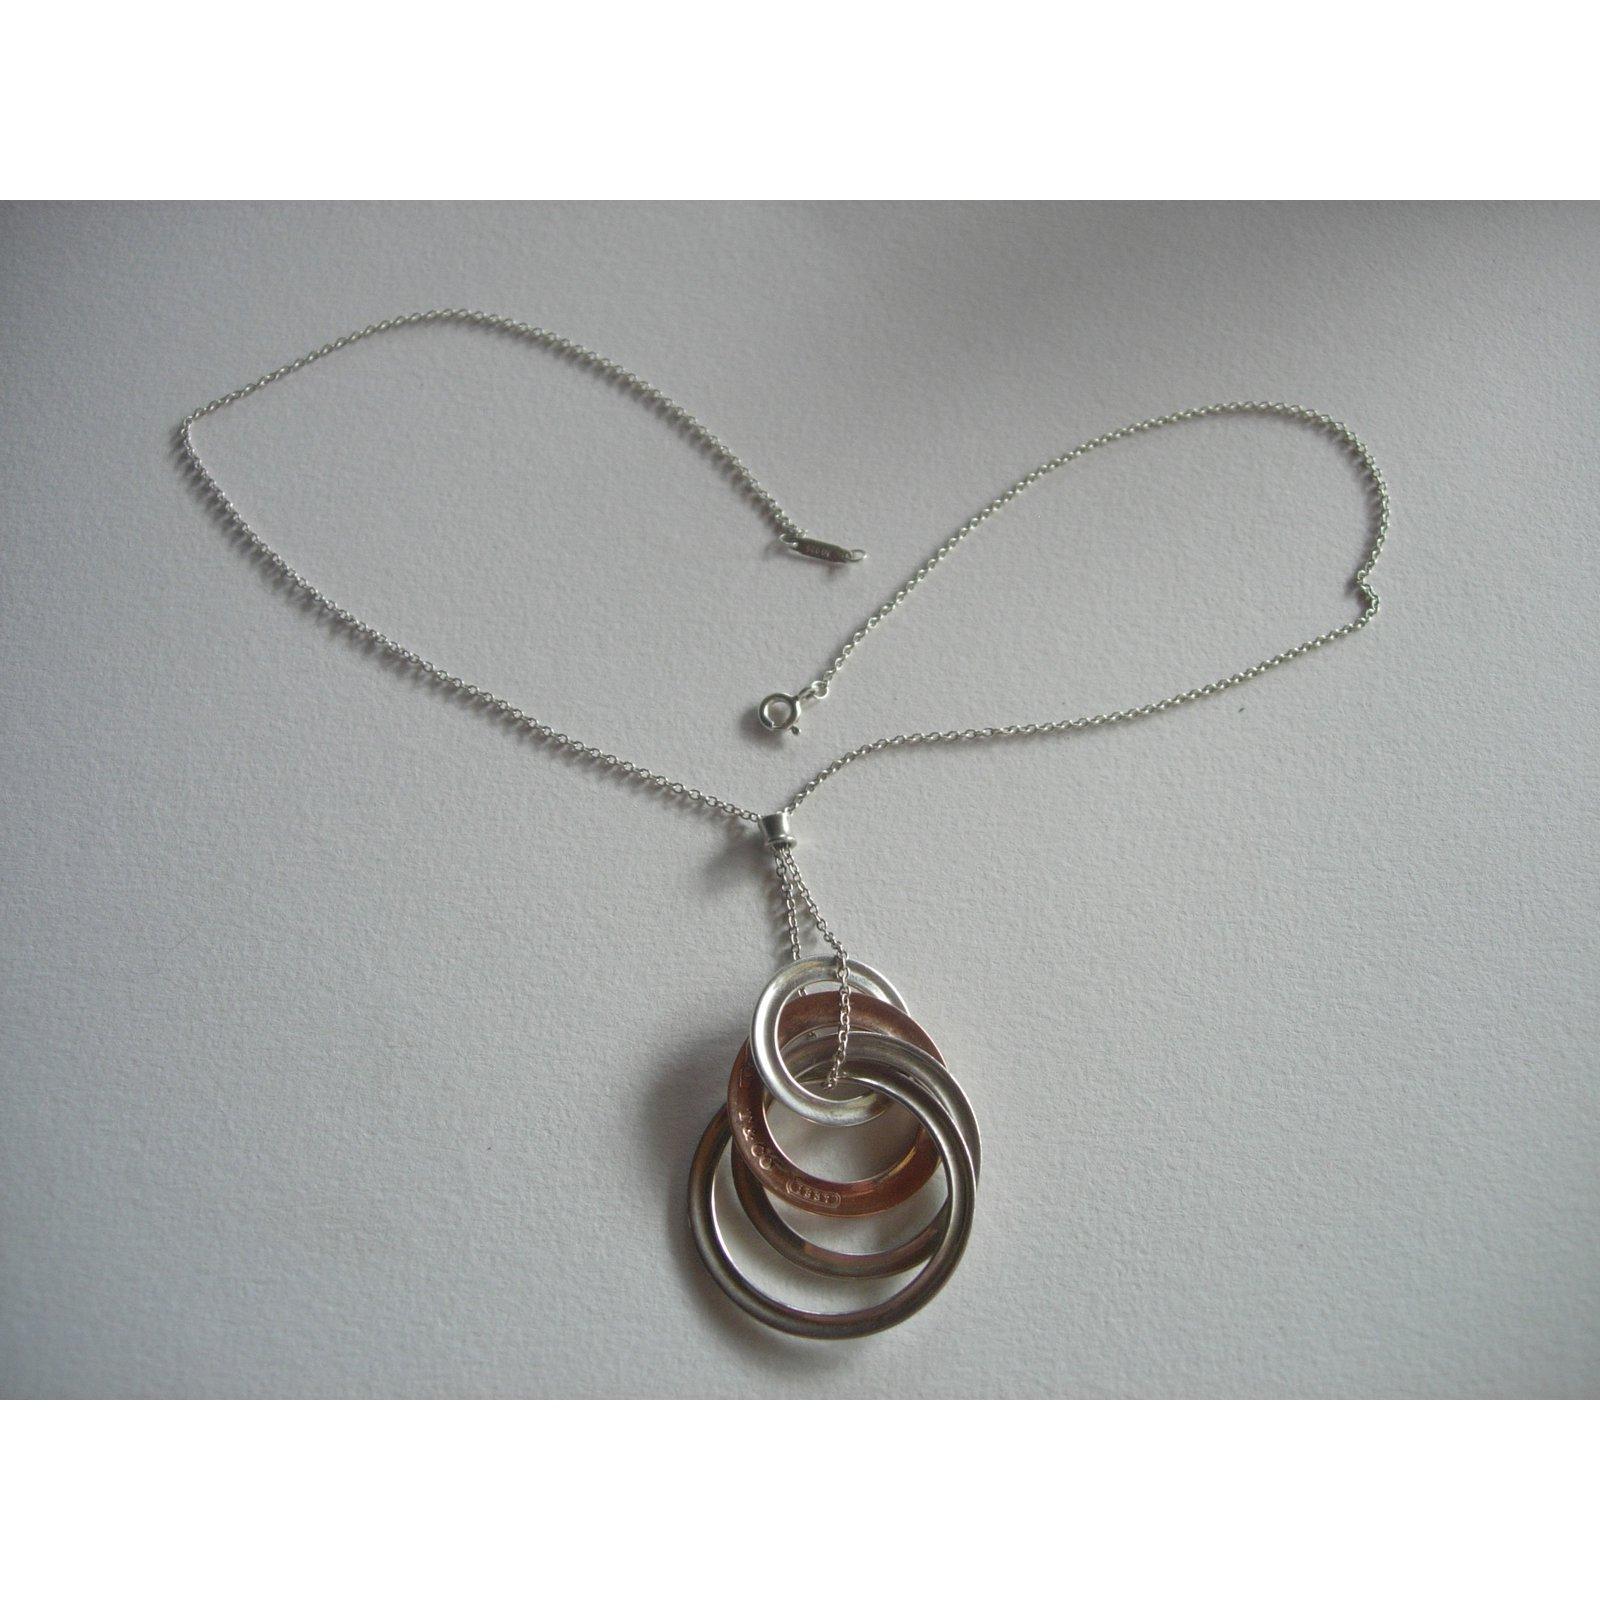 6ddf7a4ec Tiffany & Co Pendant necklace Pendant necklaces Silver Silvery ref.29490 -  Joli Closet